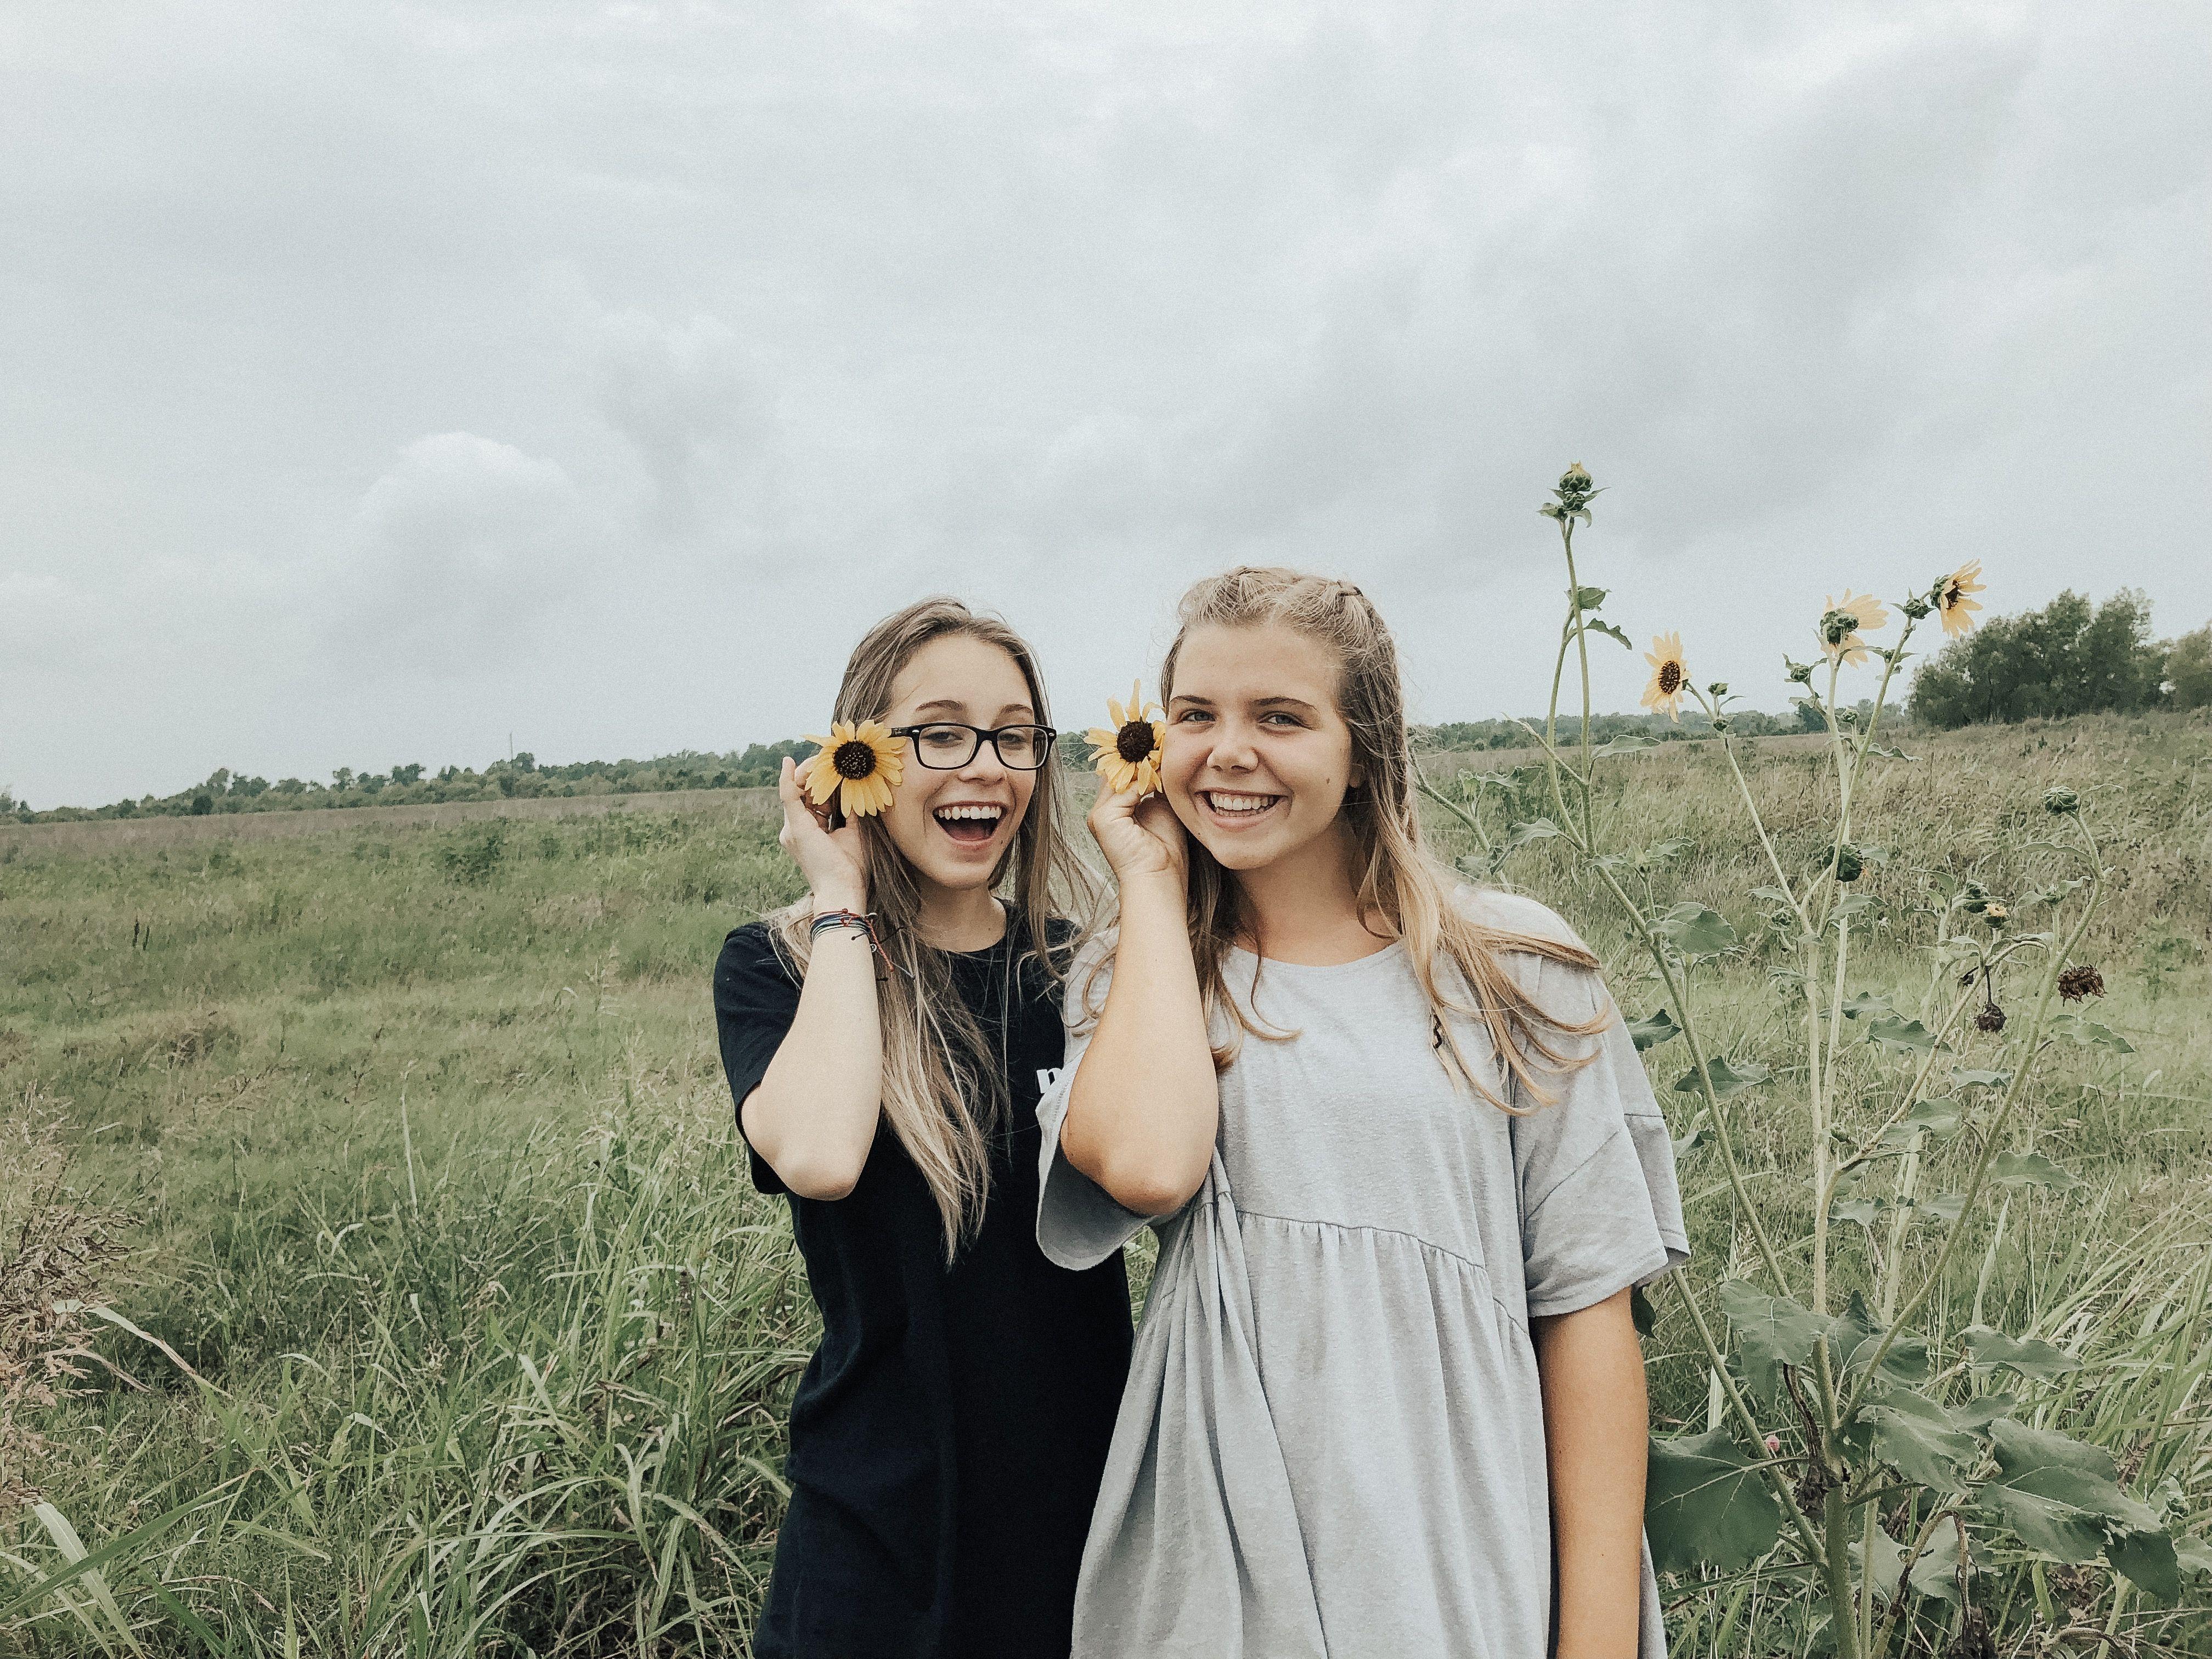 Artsy Pics Summertime Best Friends Photography Ideas Friendship Beat Bestfriends Bffs